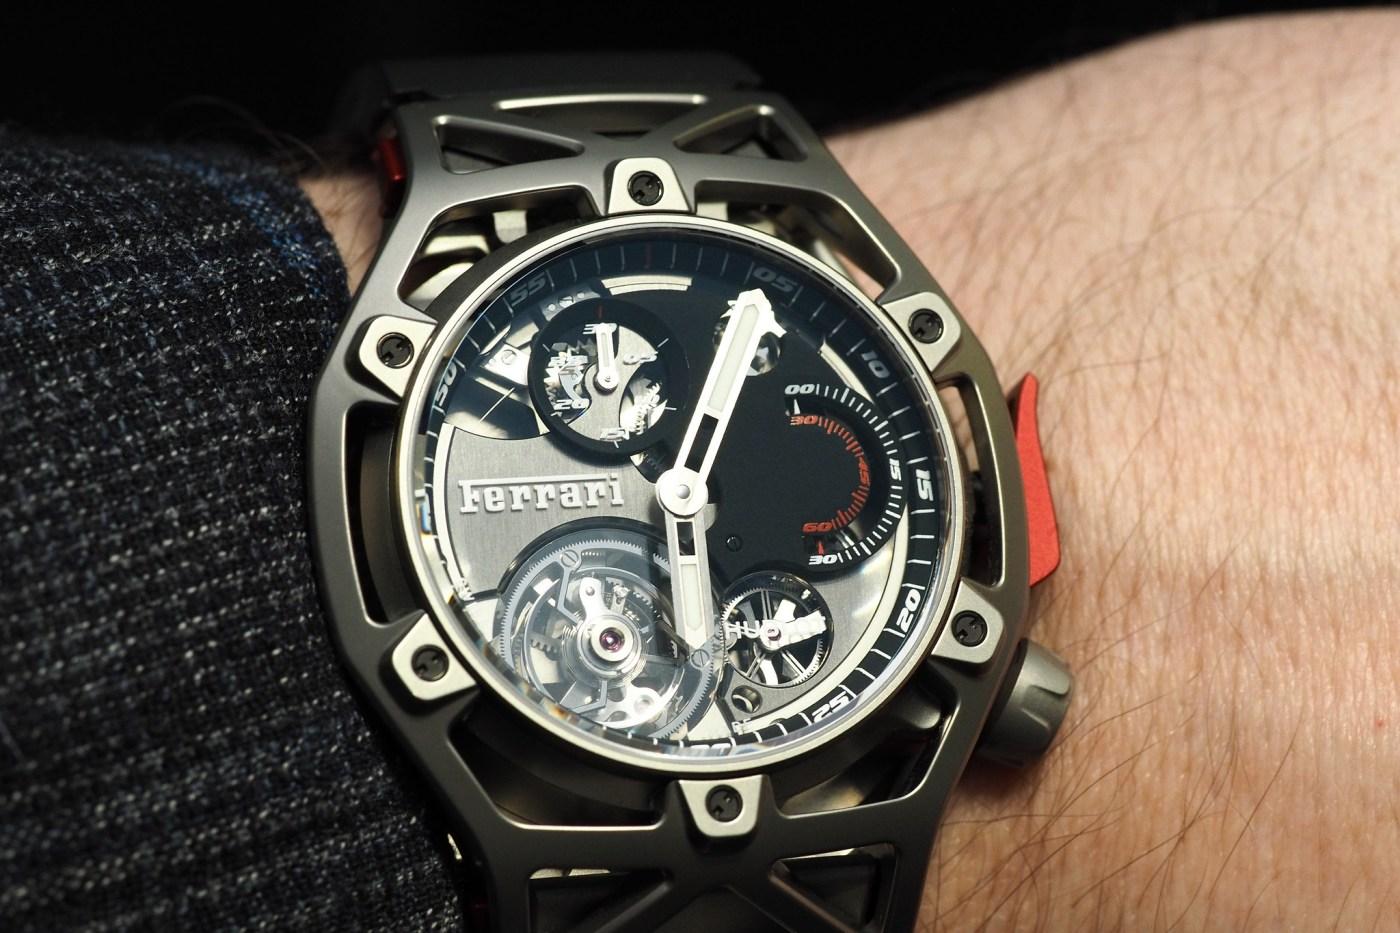 Techframe Ferrari Tourbillon Chronograph titanium wristshot